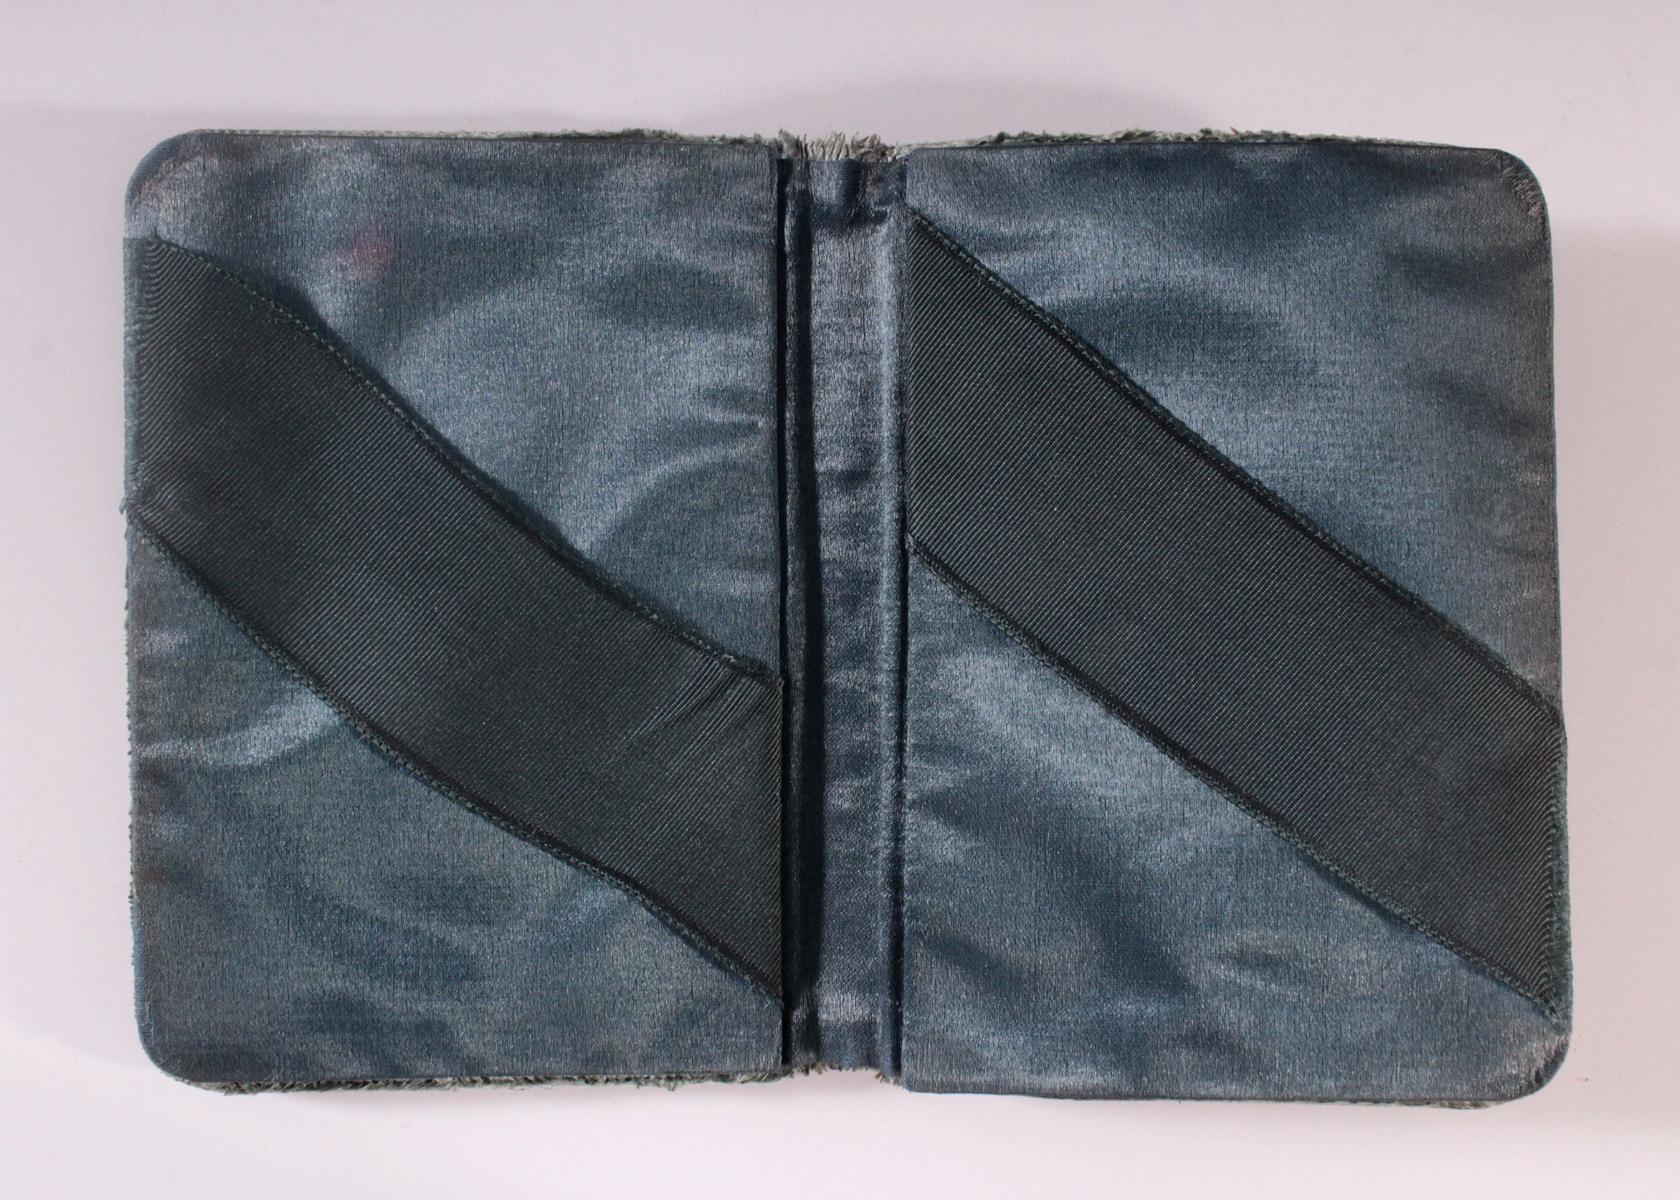 Ballkarten-Etui, 19. Jahrhundert-2